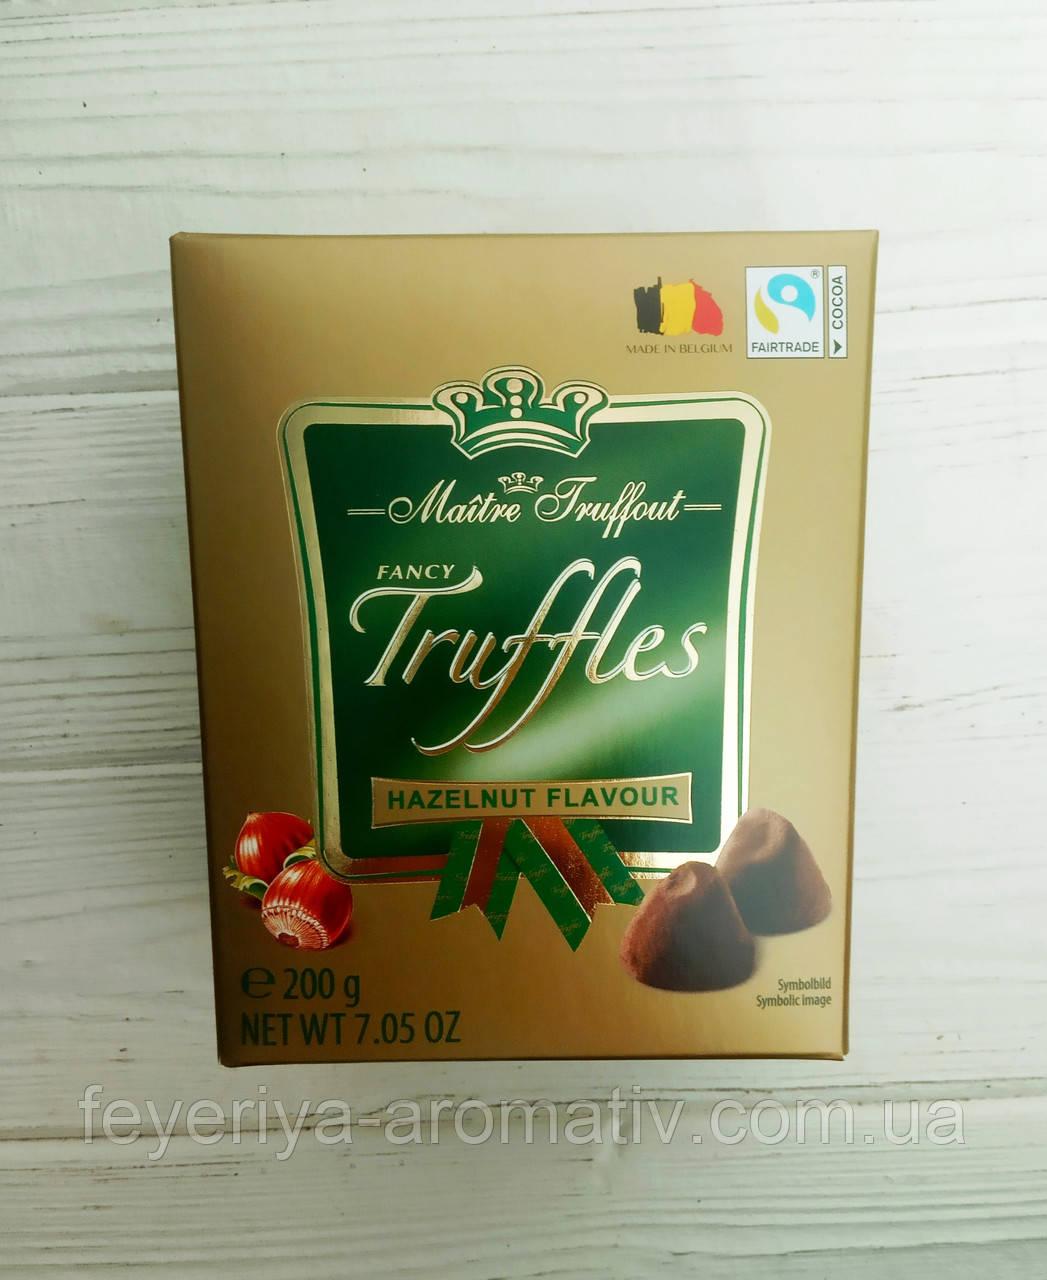 Трюфель Maitre Truffout Truffles Hazelnut Flavour, 200гр (Франция)